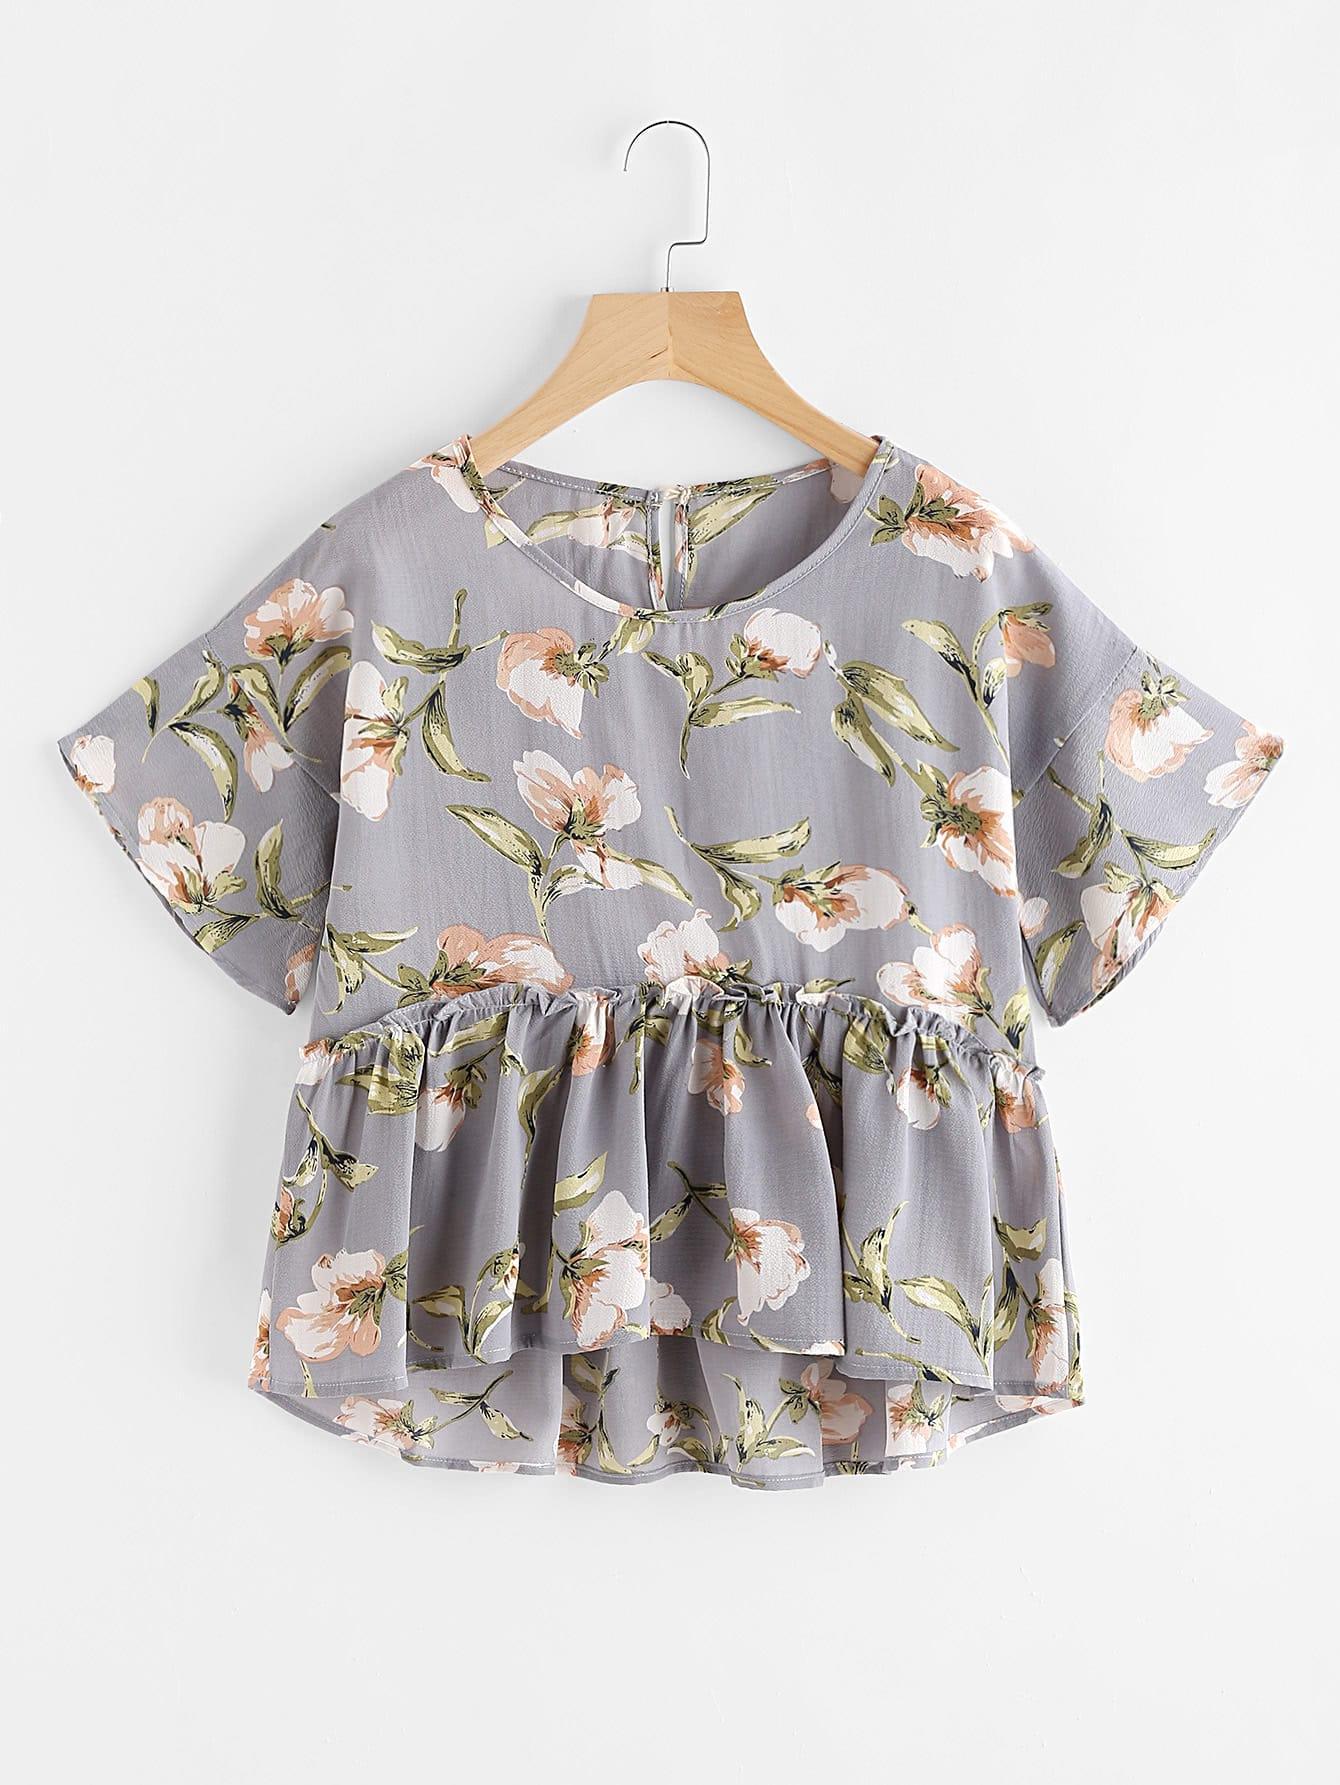 Florals Keyhole Back Frill Hem Babydoll Blouse v neck floral flare sleeve tunic top